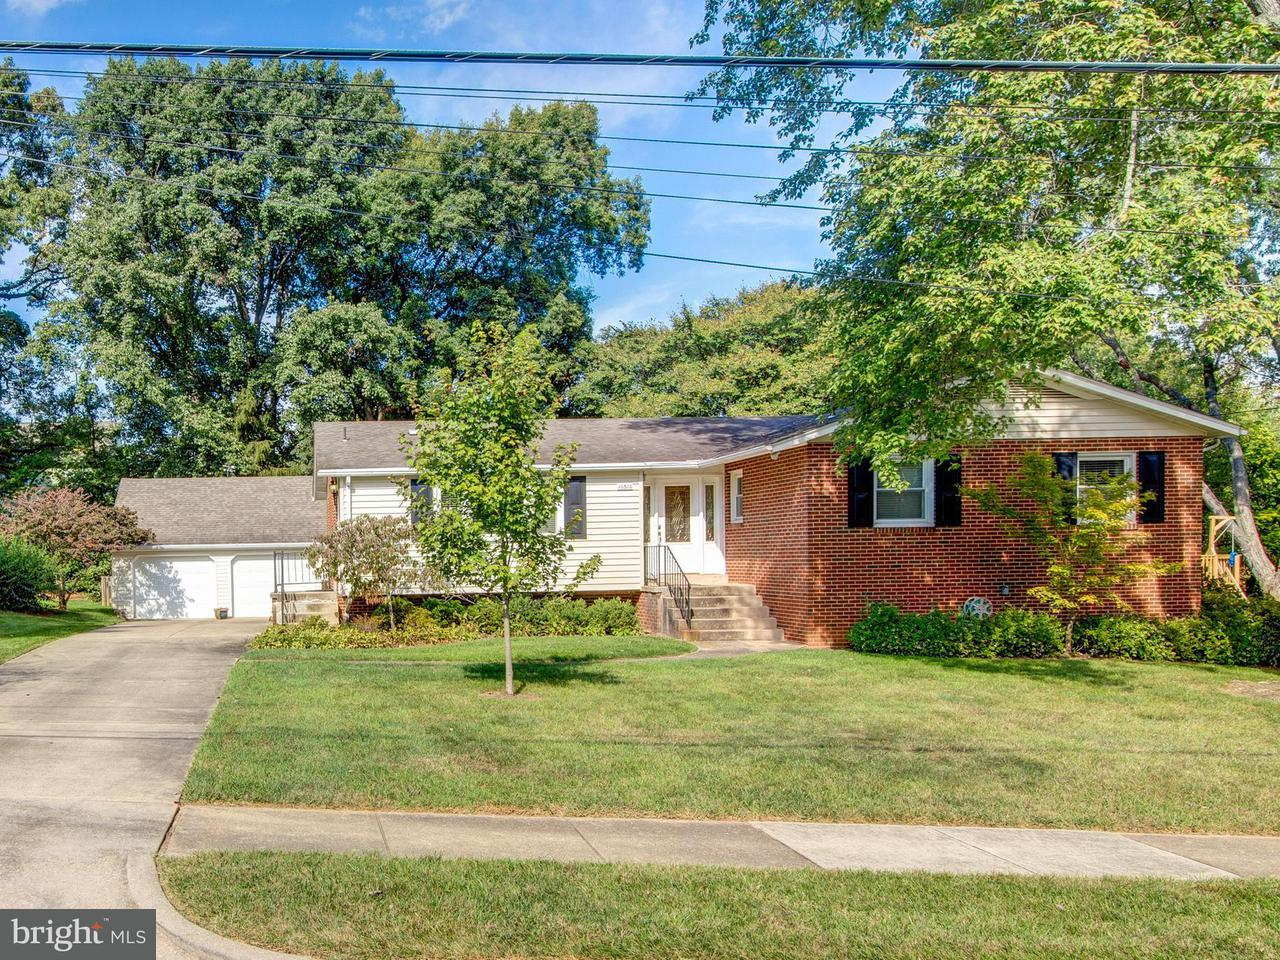 獨棟家庭住宅 為 出售 在 10306 Wood Road 10306 Wood Road Fairfax, 弗吉尼亞州 22030 美國